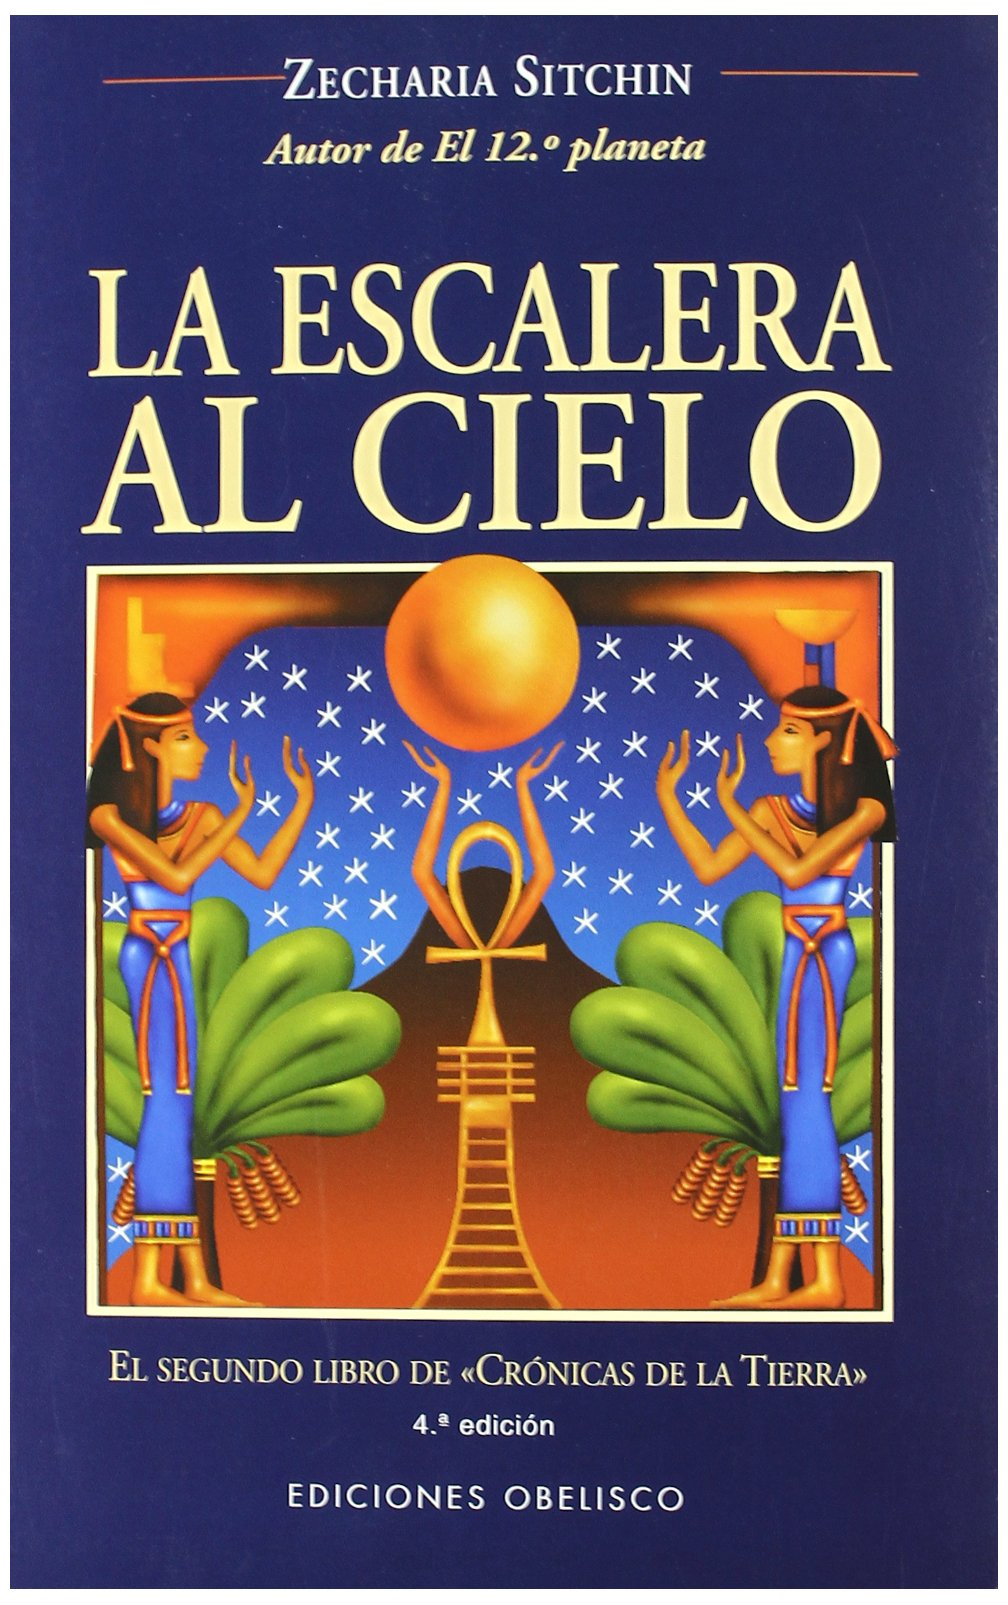 La escalera al cielo (MENSAJEROS DEL UNIVERSO) Tapa blanda – 27 may 2002 ZECHARIA SITCHIN Grian EDICIONES OBELISCO S.L. 8477208964